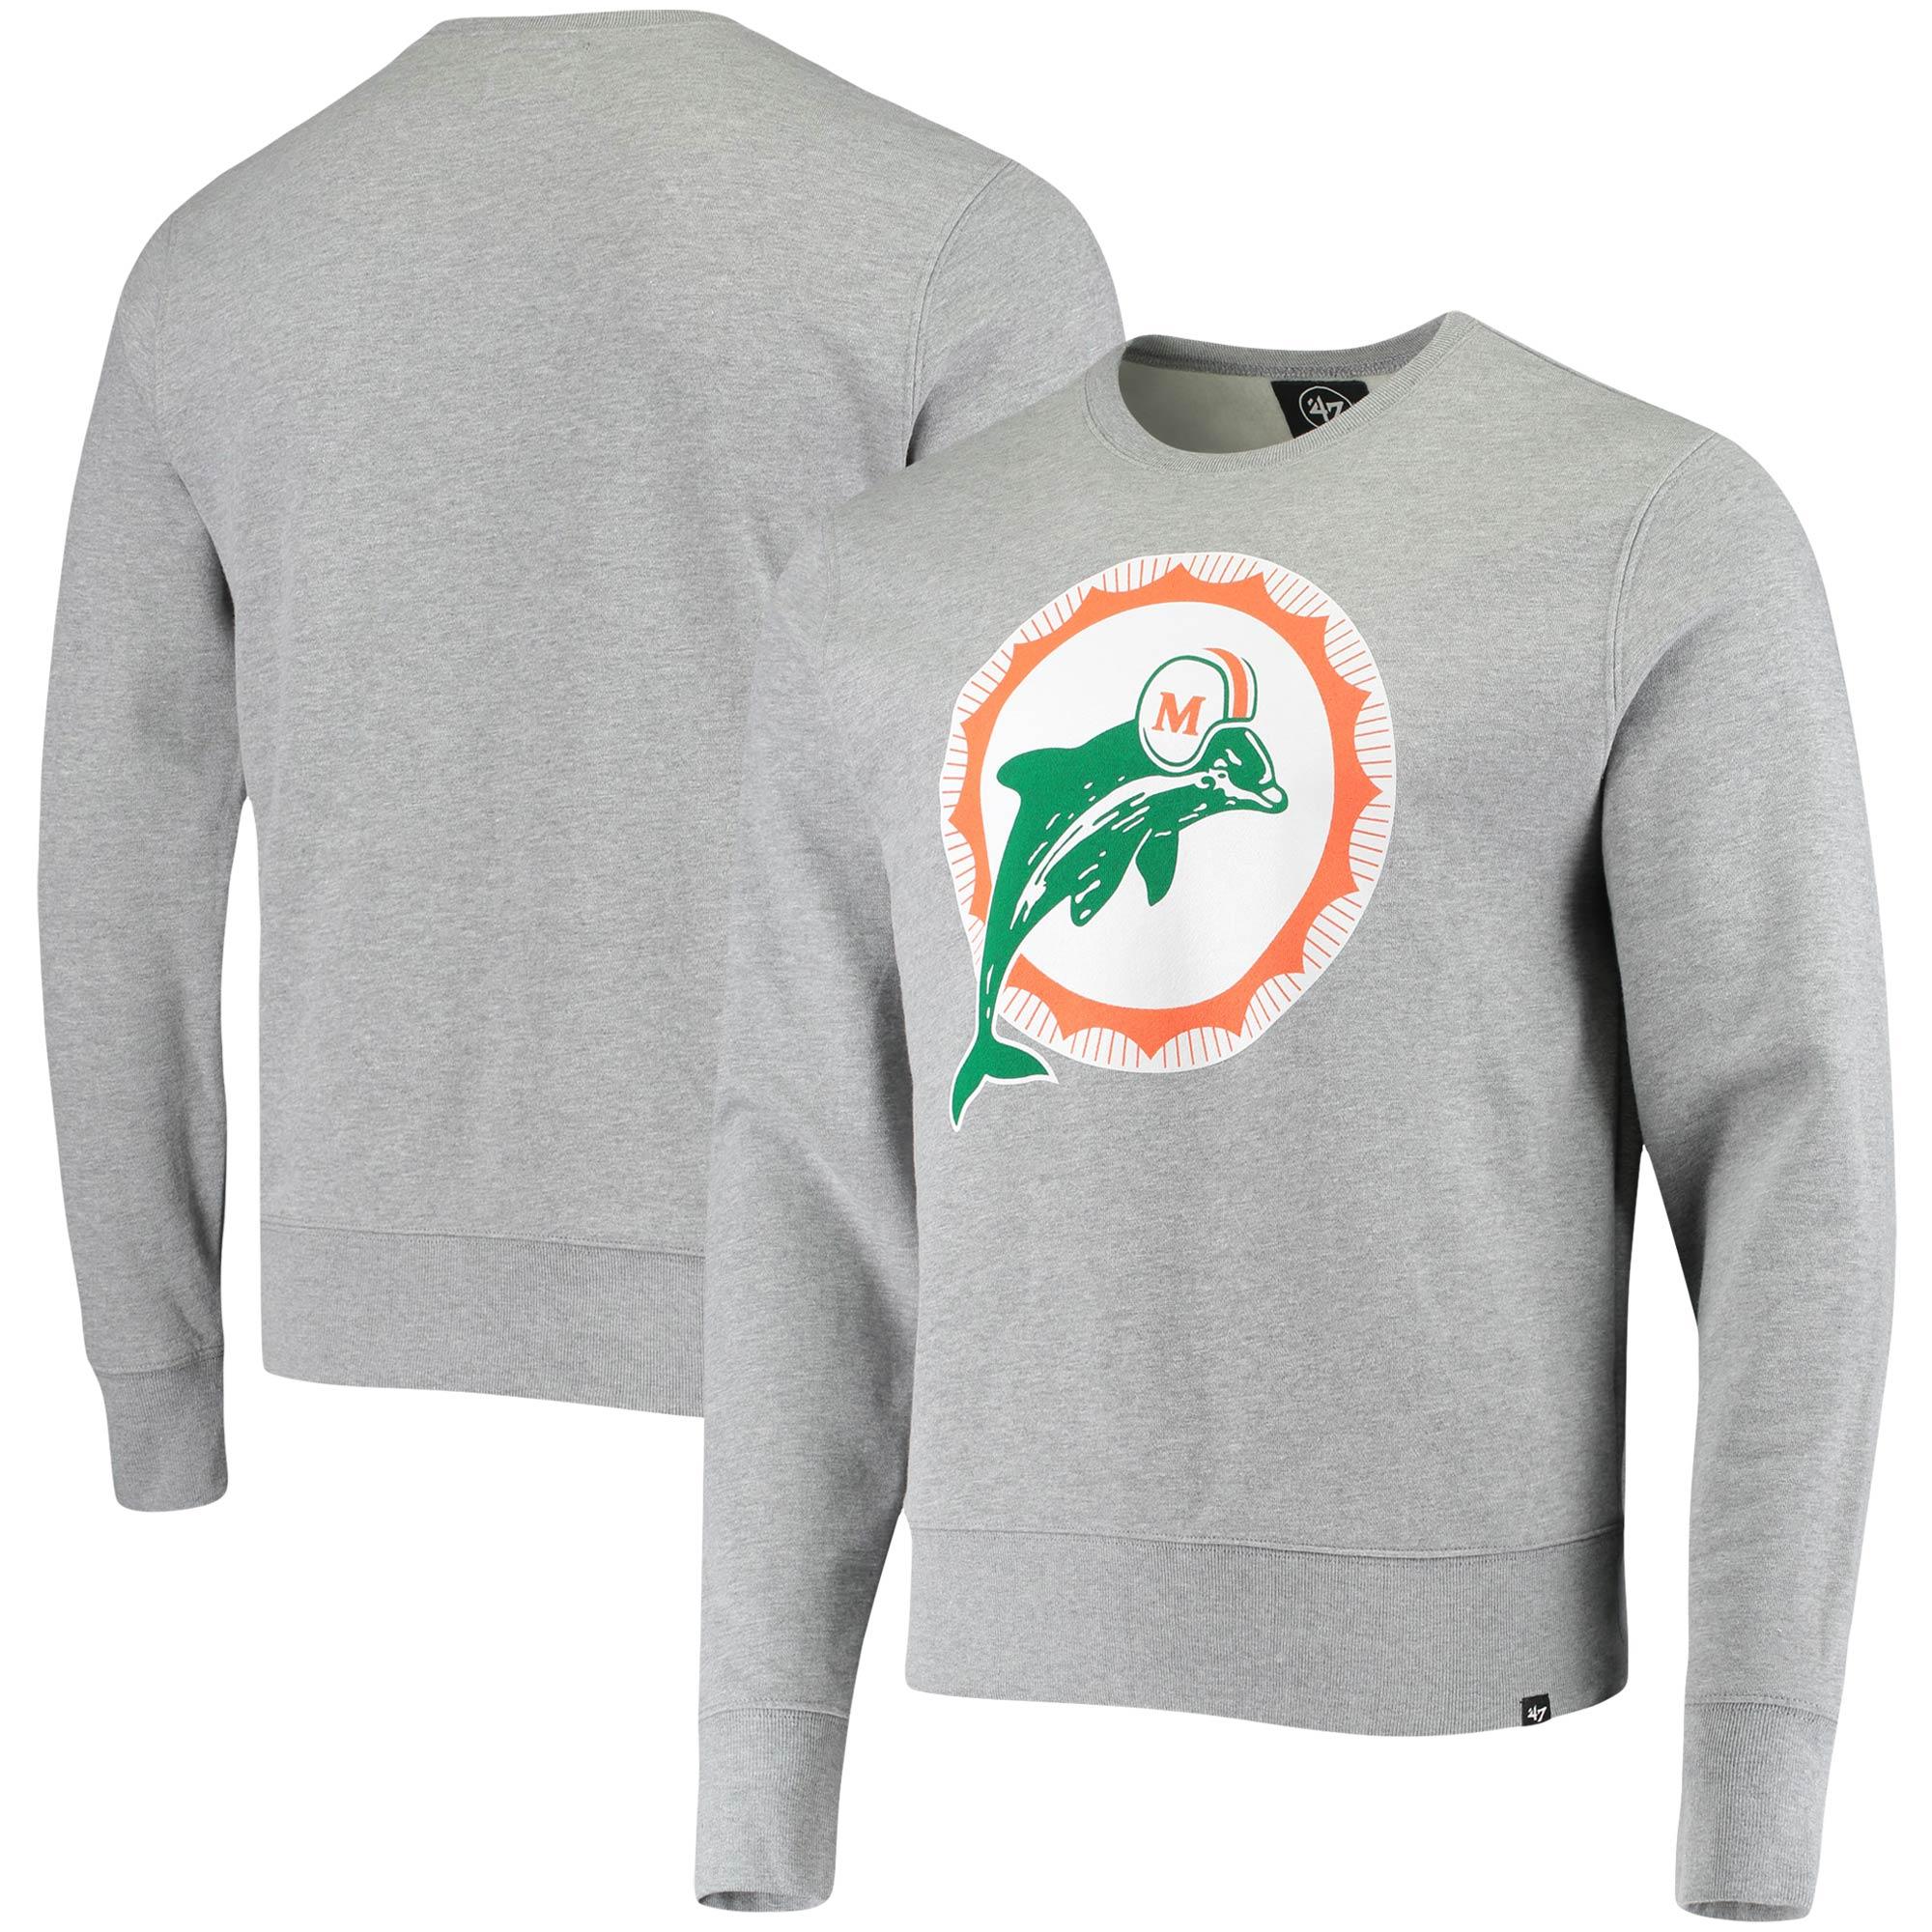 Miami Dolphins '47 Imprint Headline Historic Logo Fleece Pullover Sweatshirt - Heathered Gray